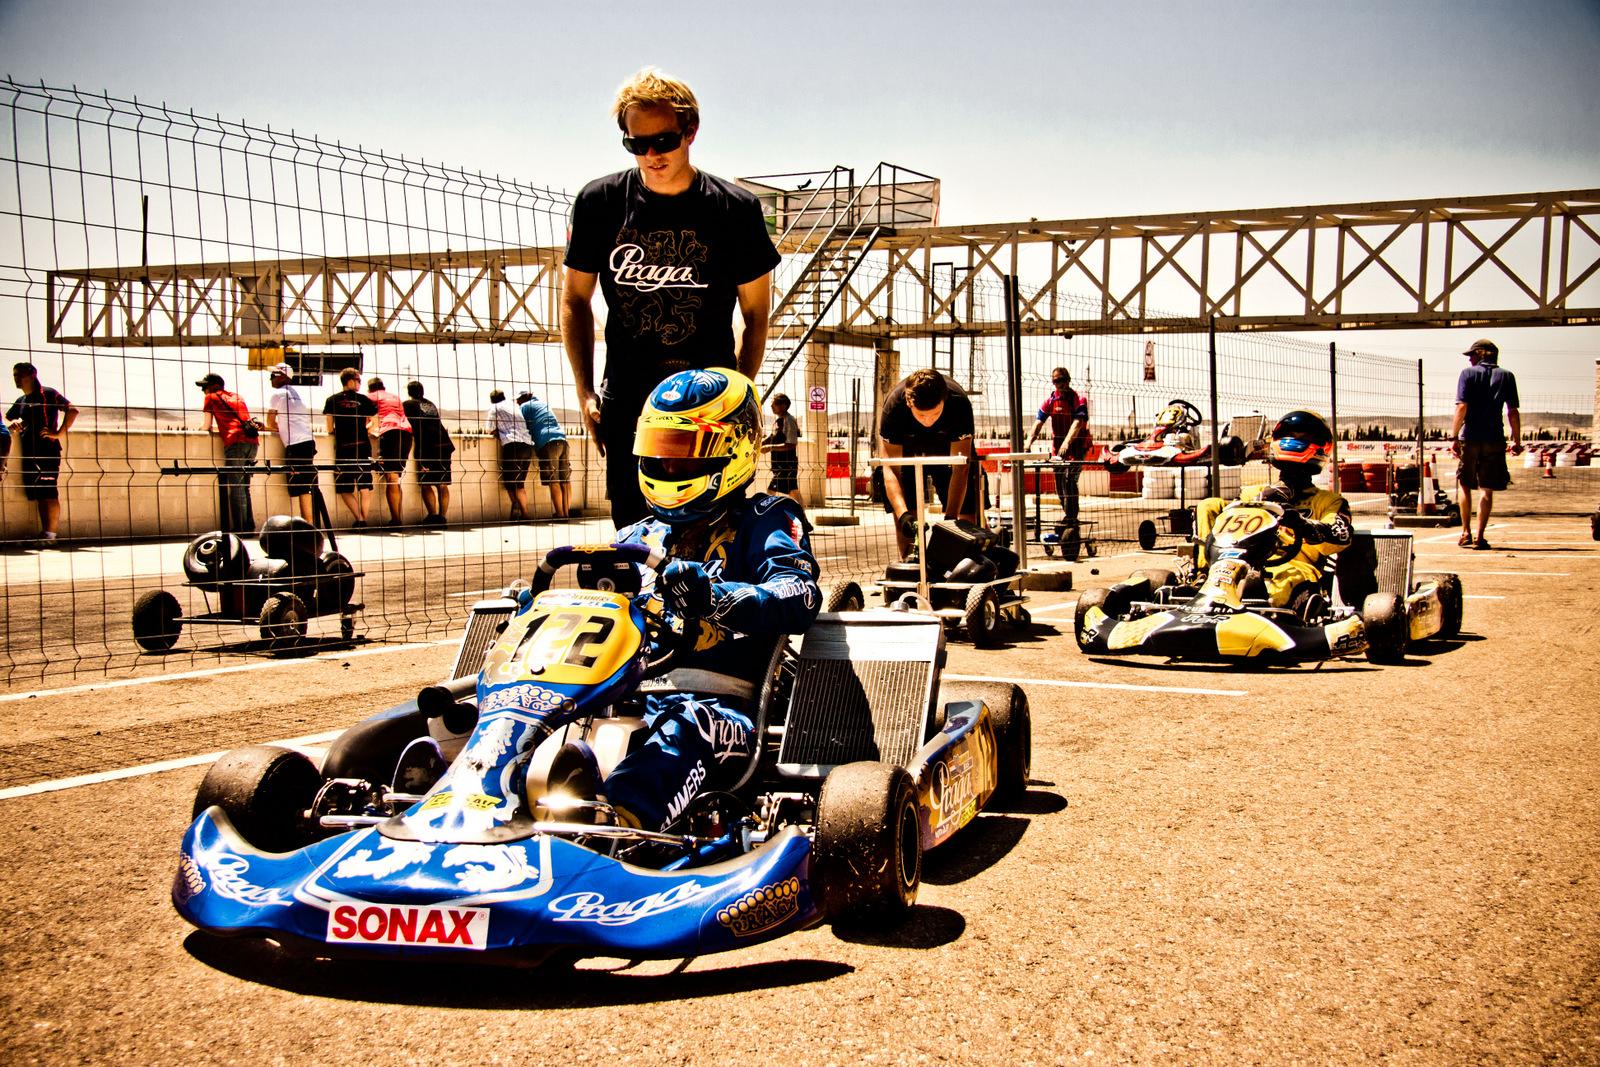 Josh Hart Racing The New Team in Rotax Challenge